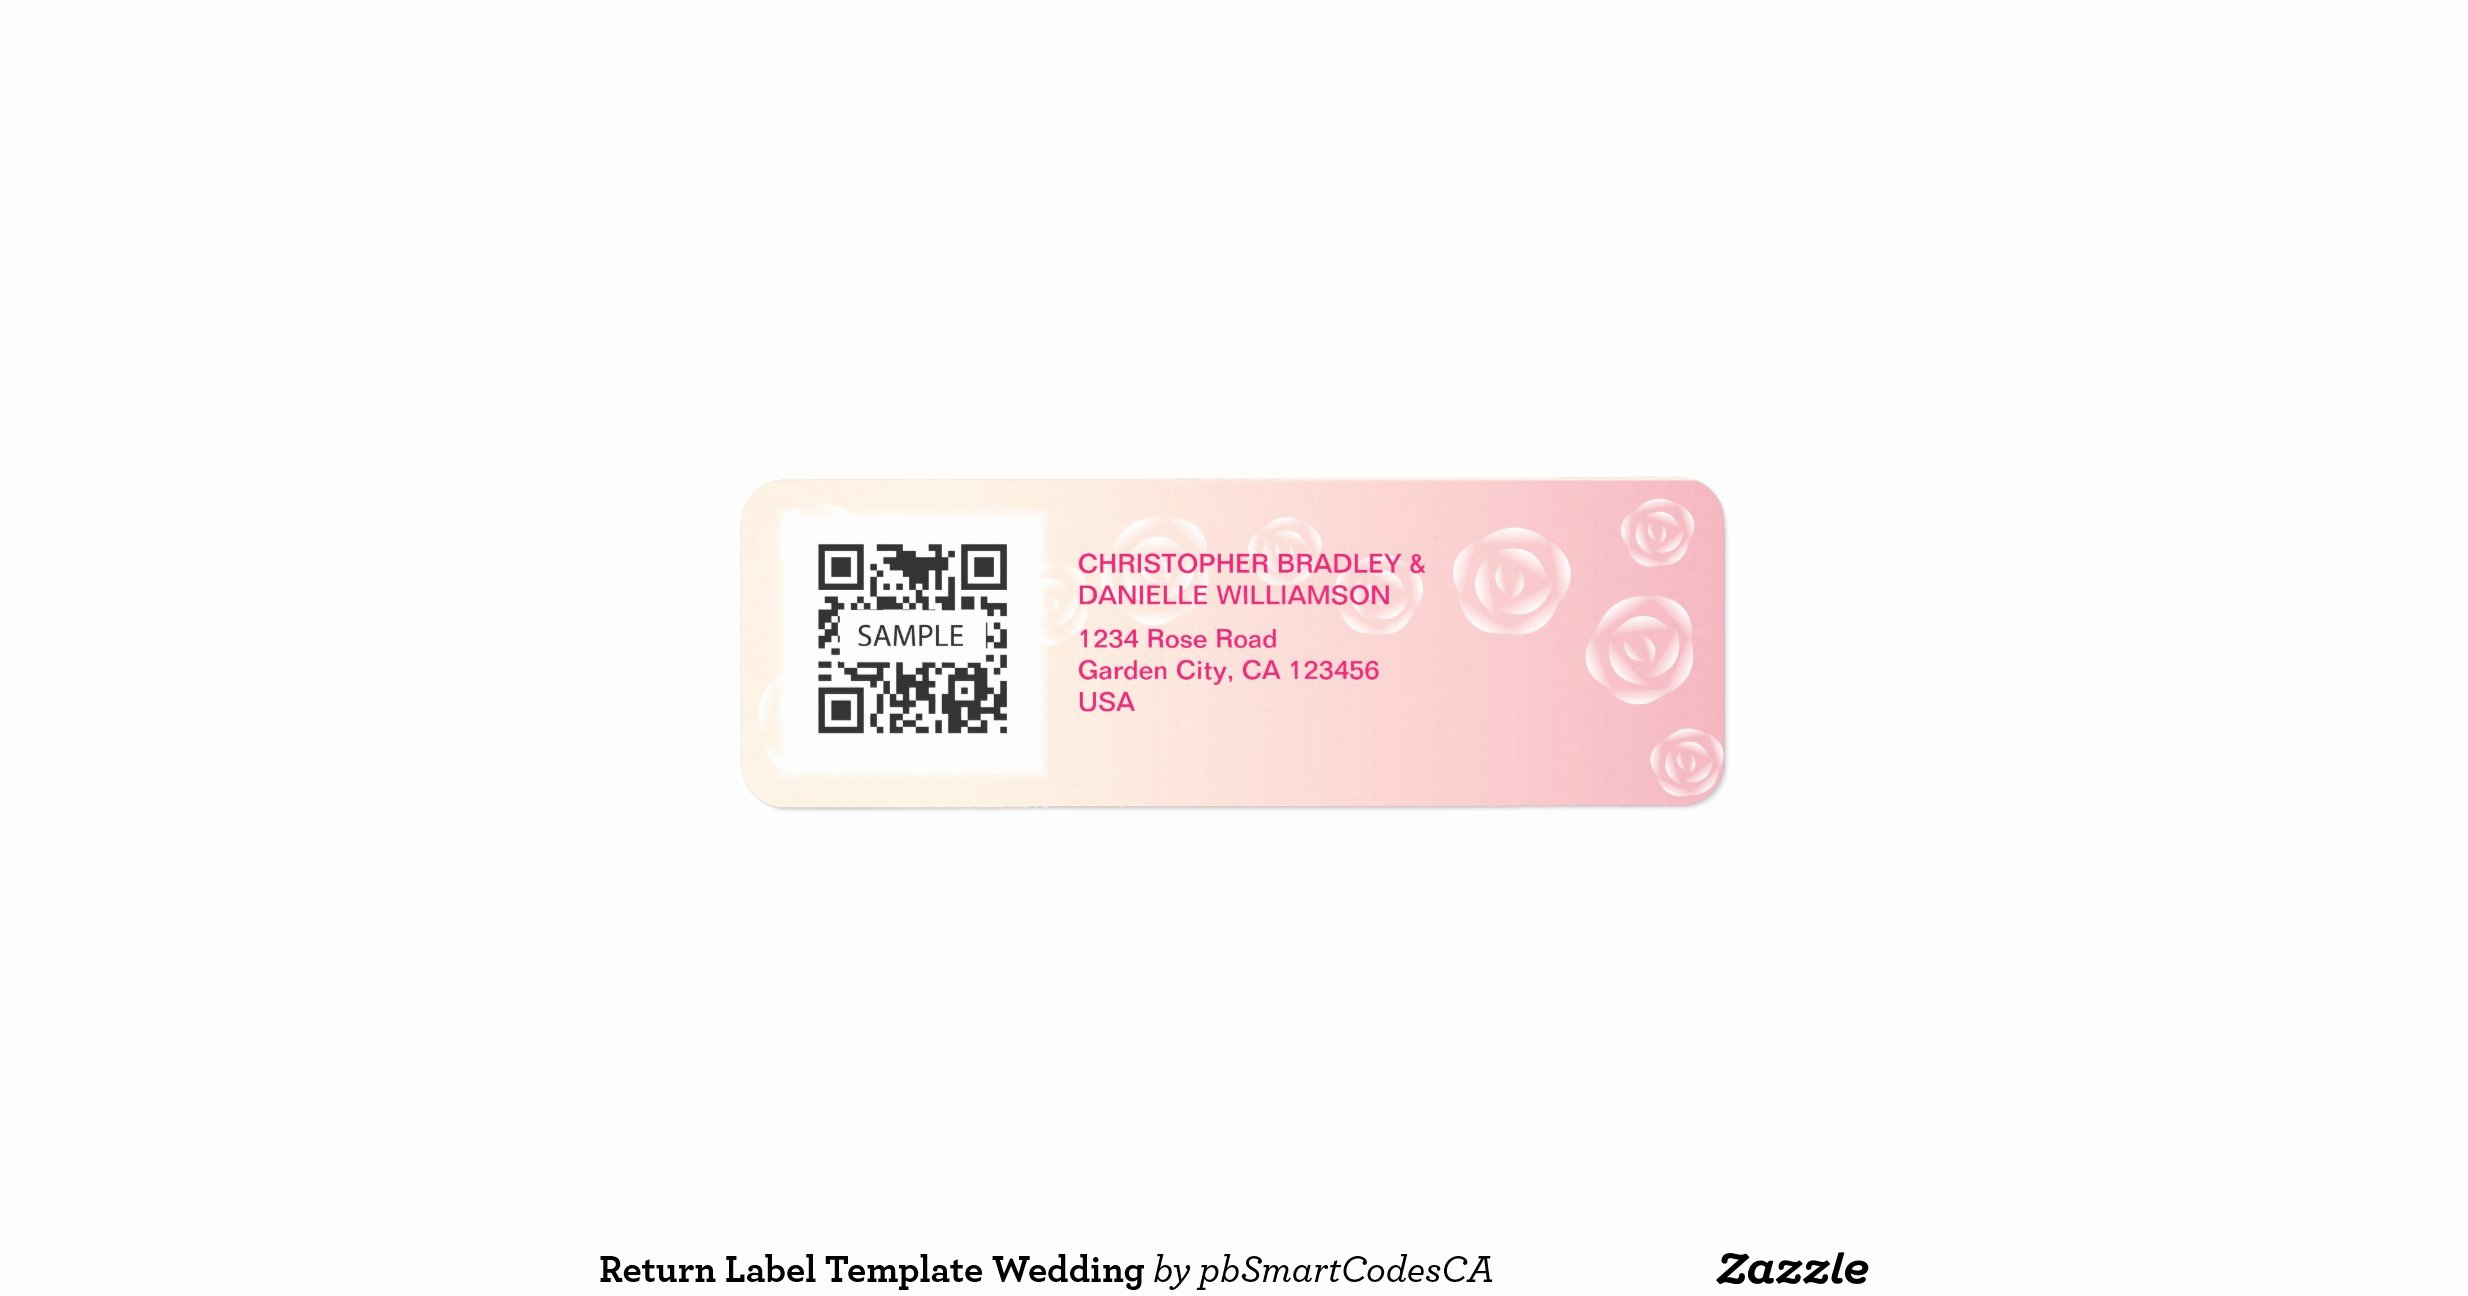 Return Label Template Wedding Return Address Label